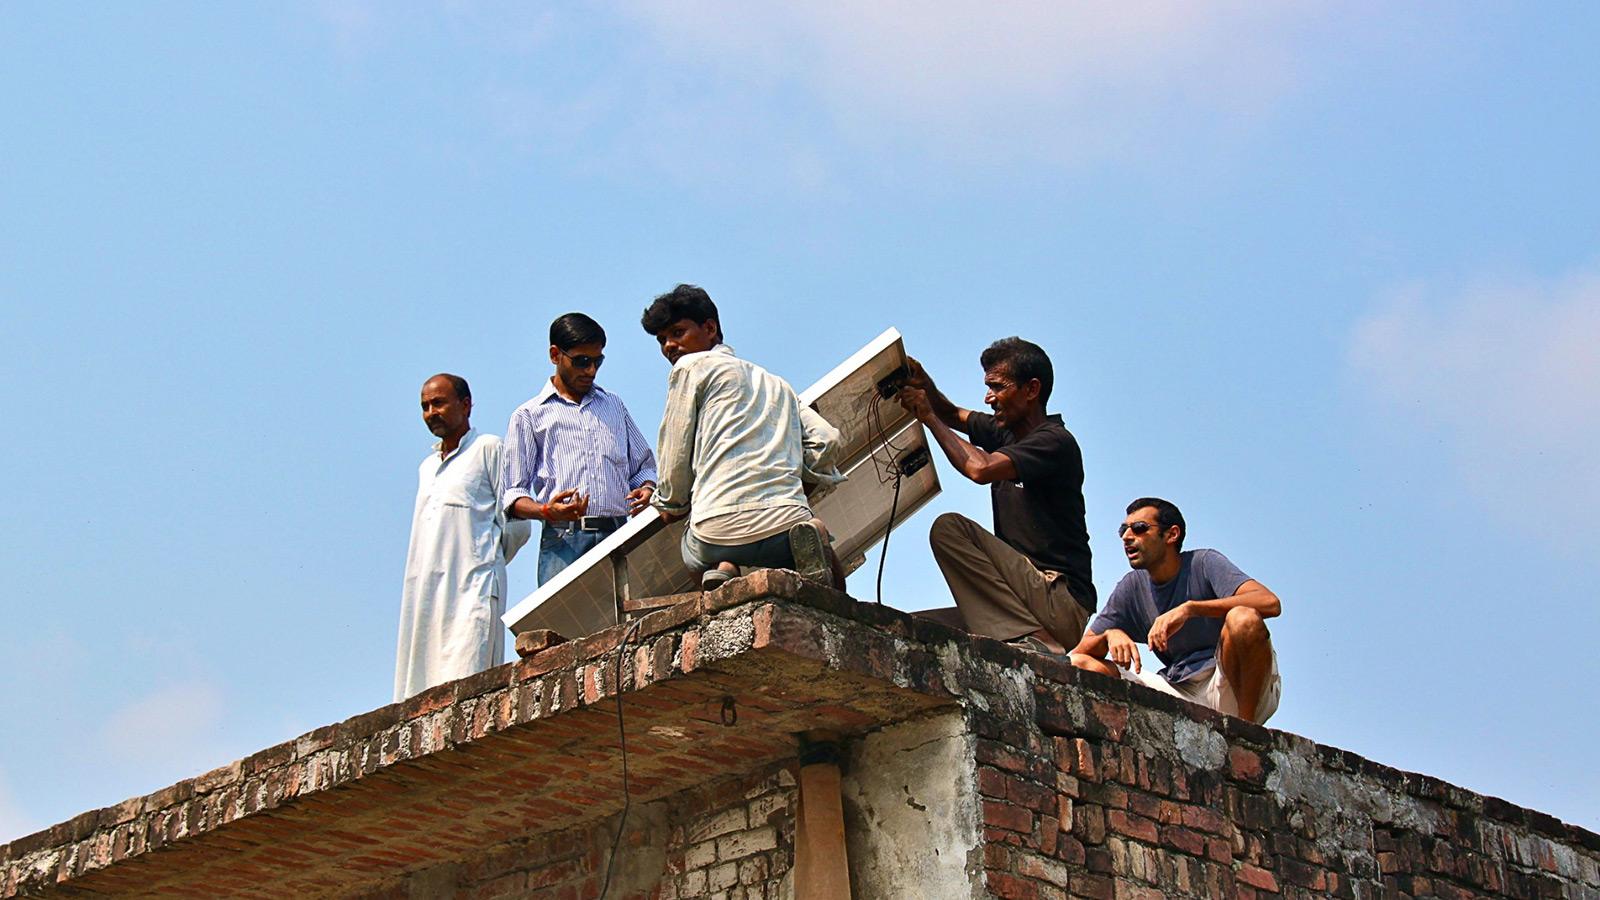 Solar panels in rural India